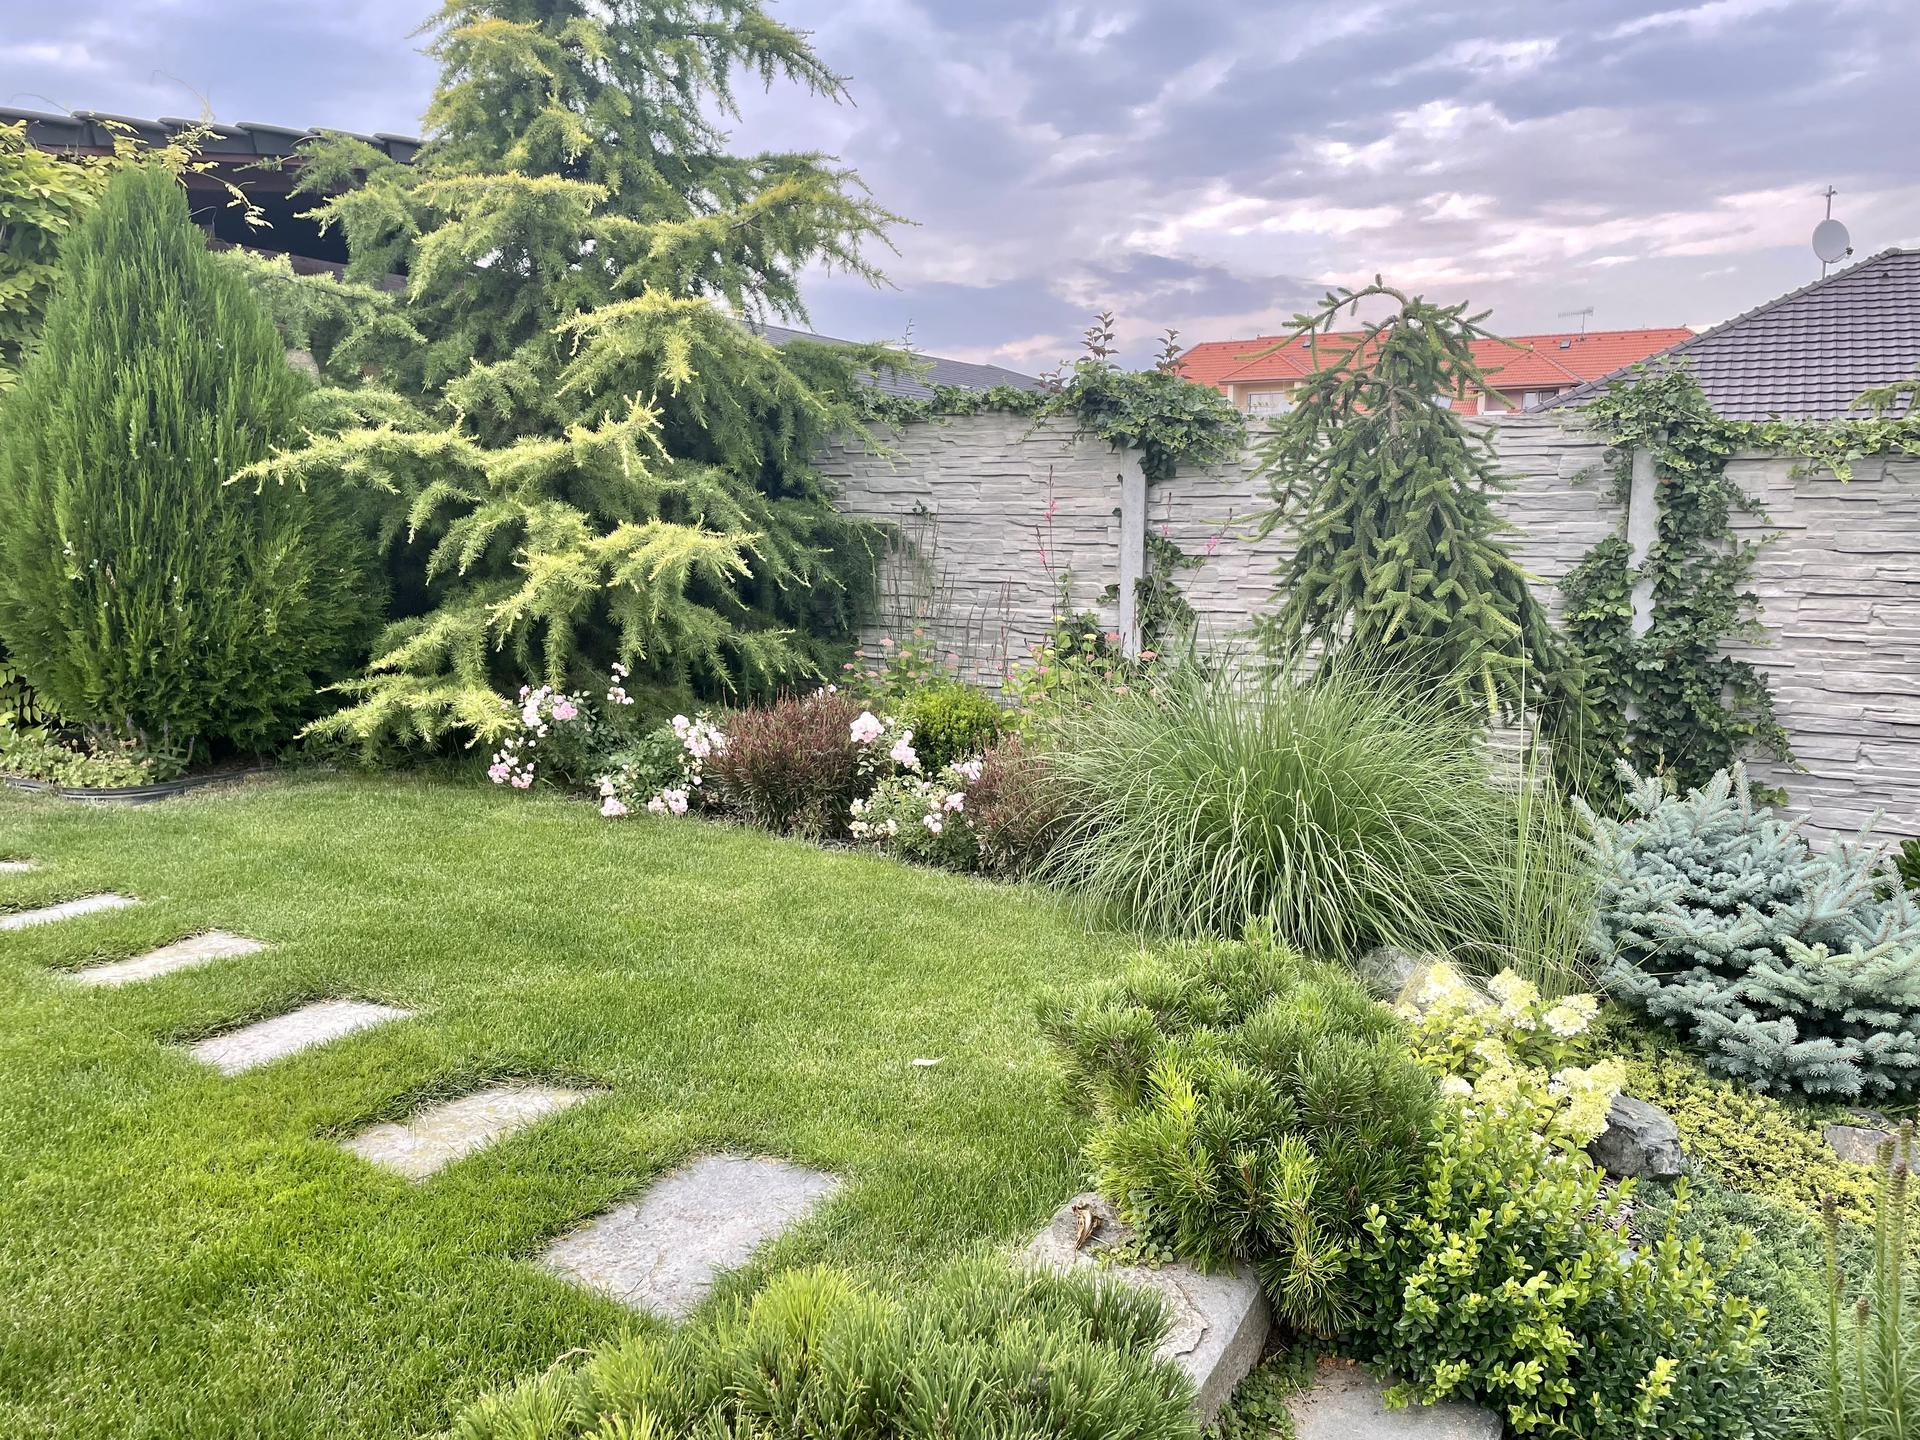 Zahrada 2021 - Obrázek č. 32